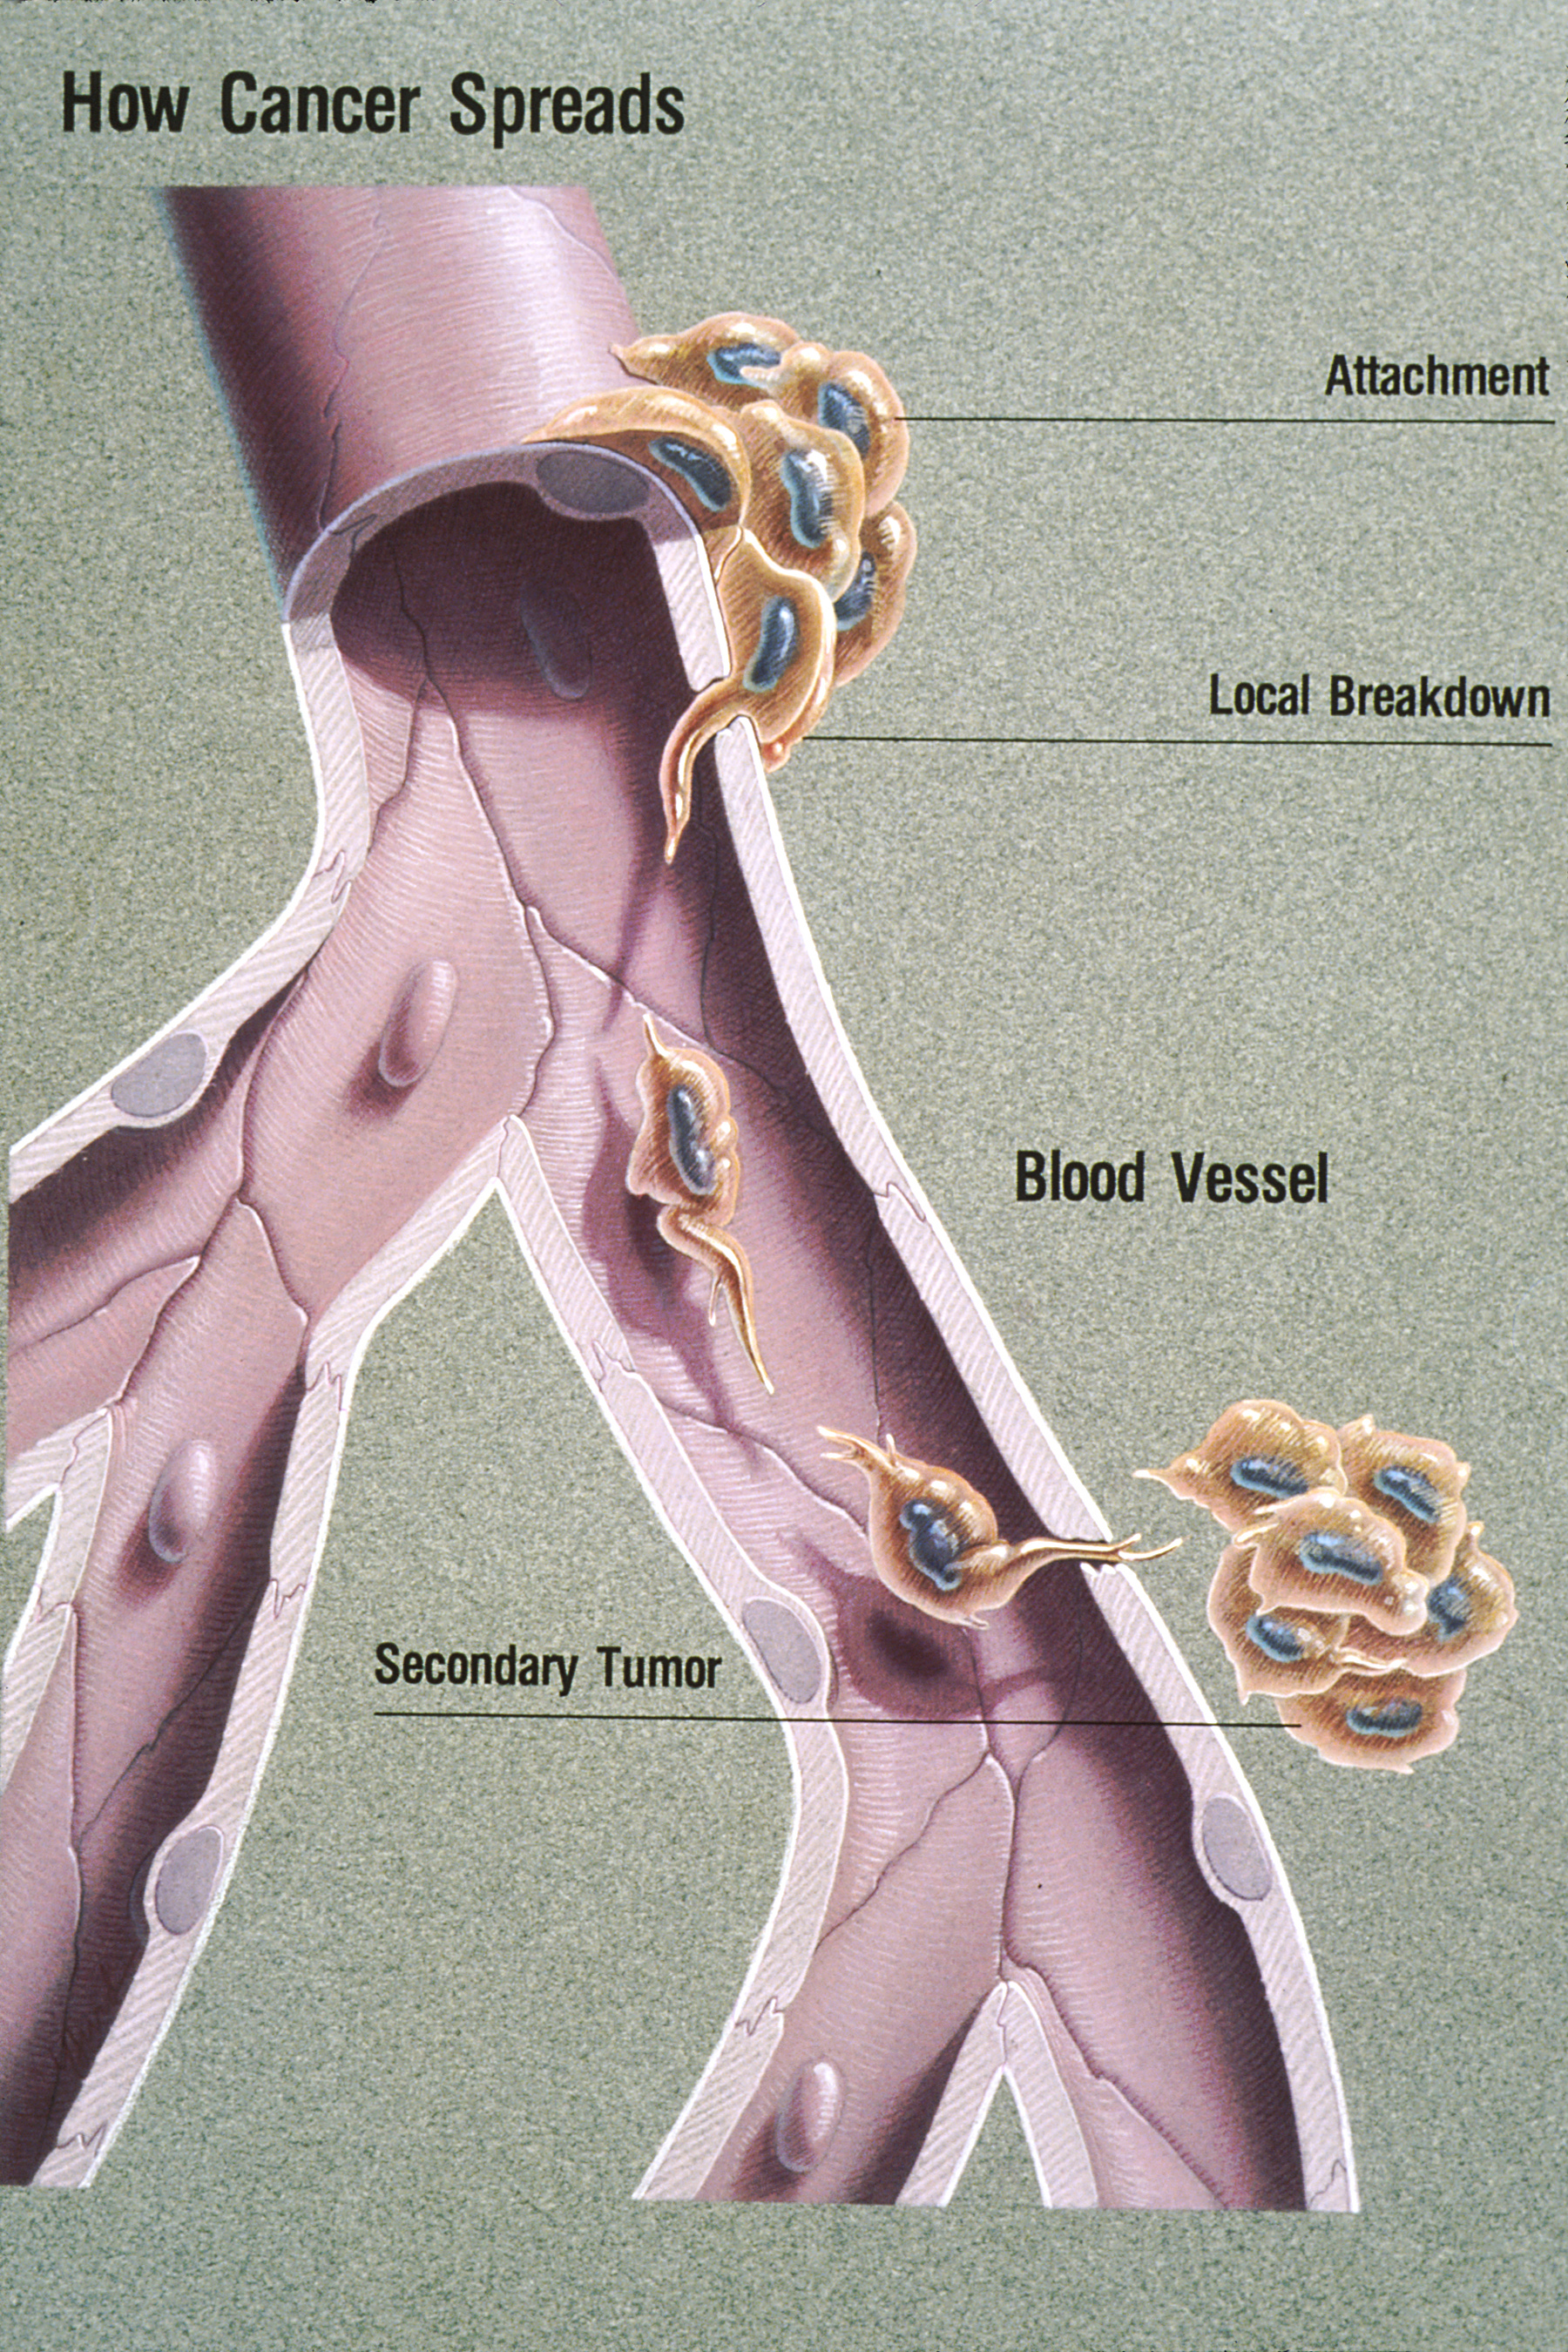 metastatic cancer means)